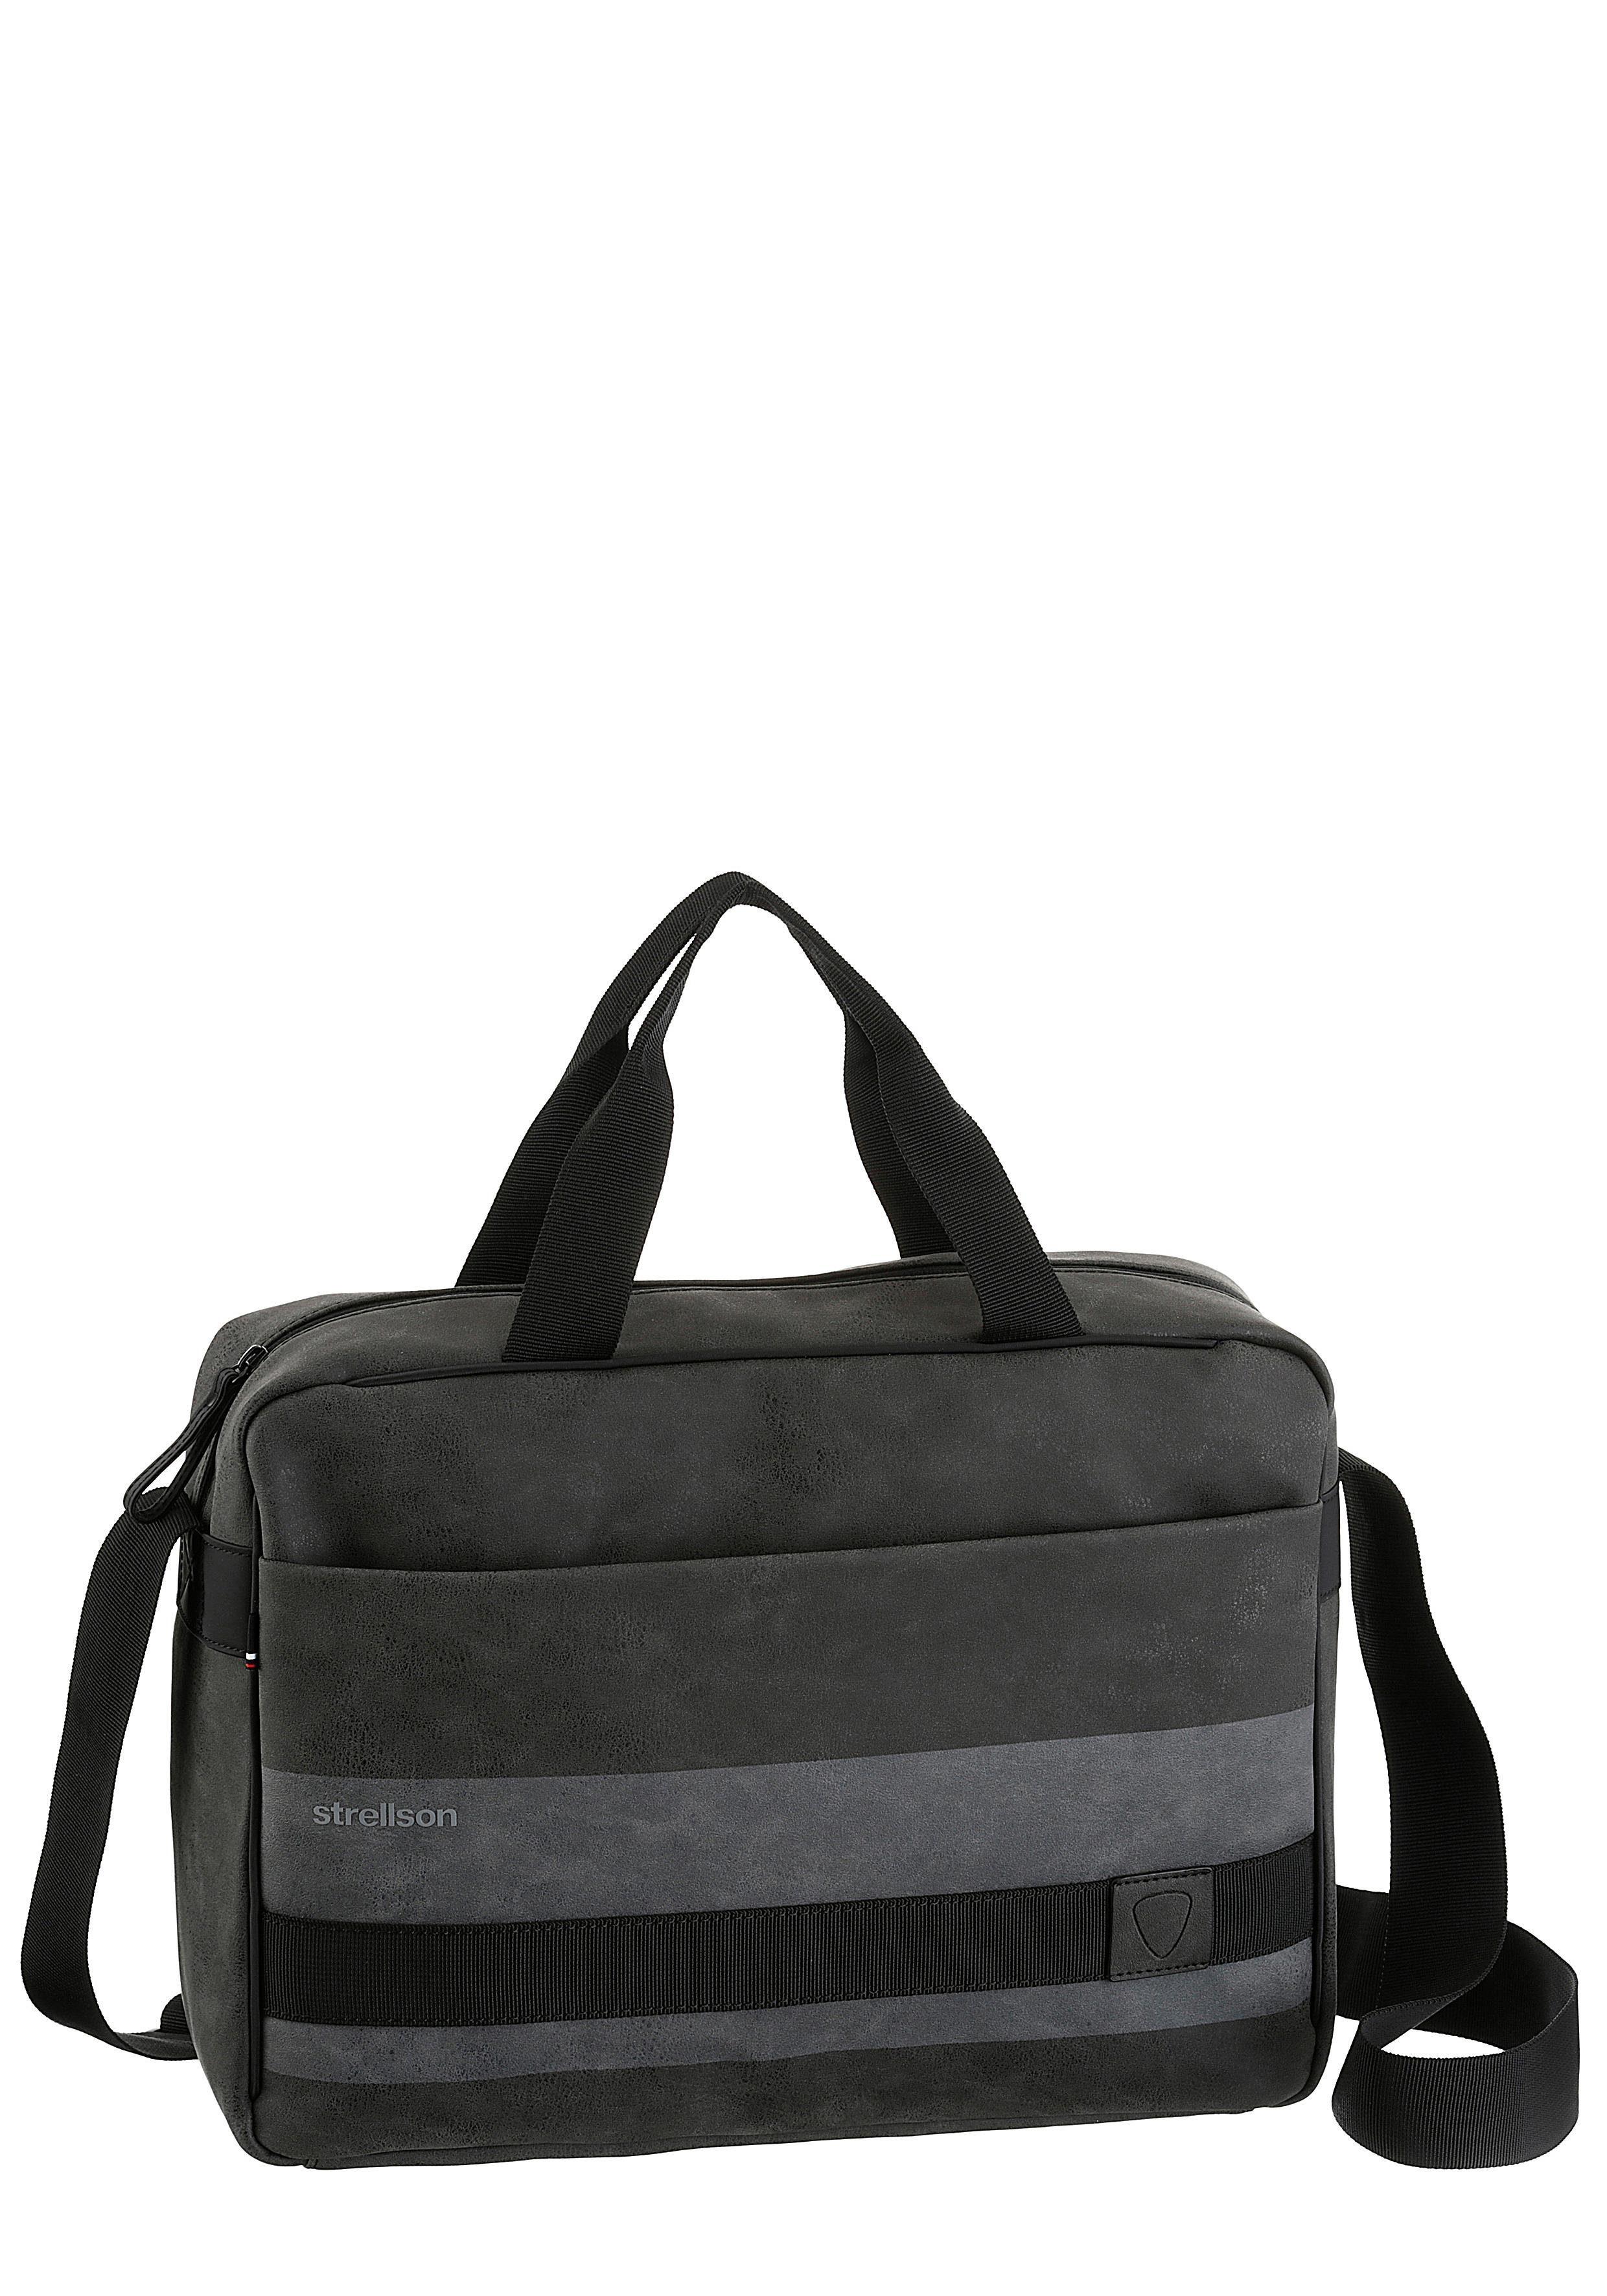 Strellson Messenger Bag, mit Laptopfach